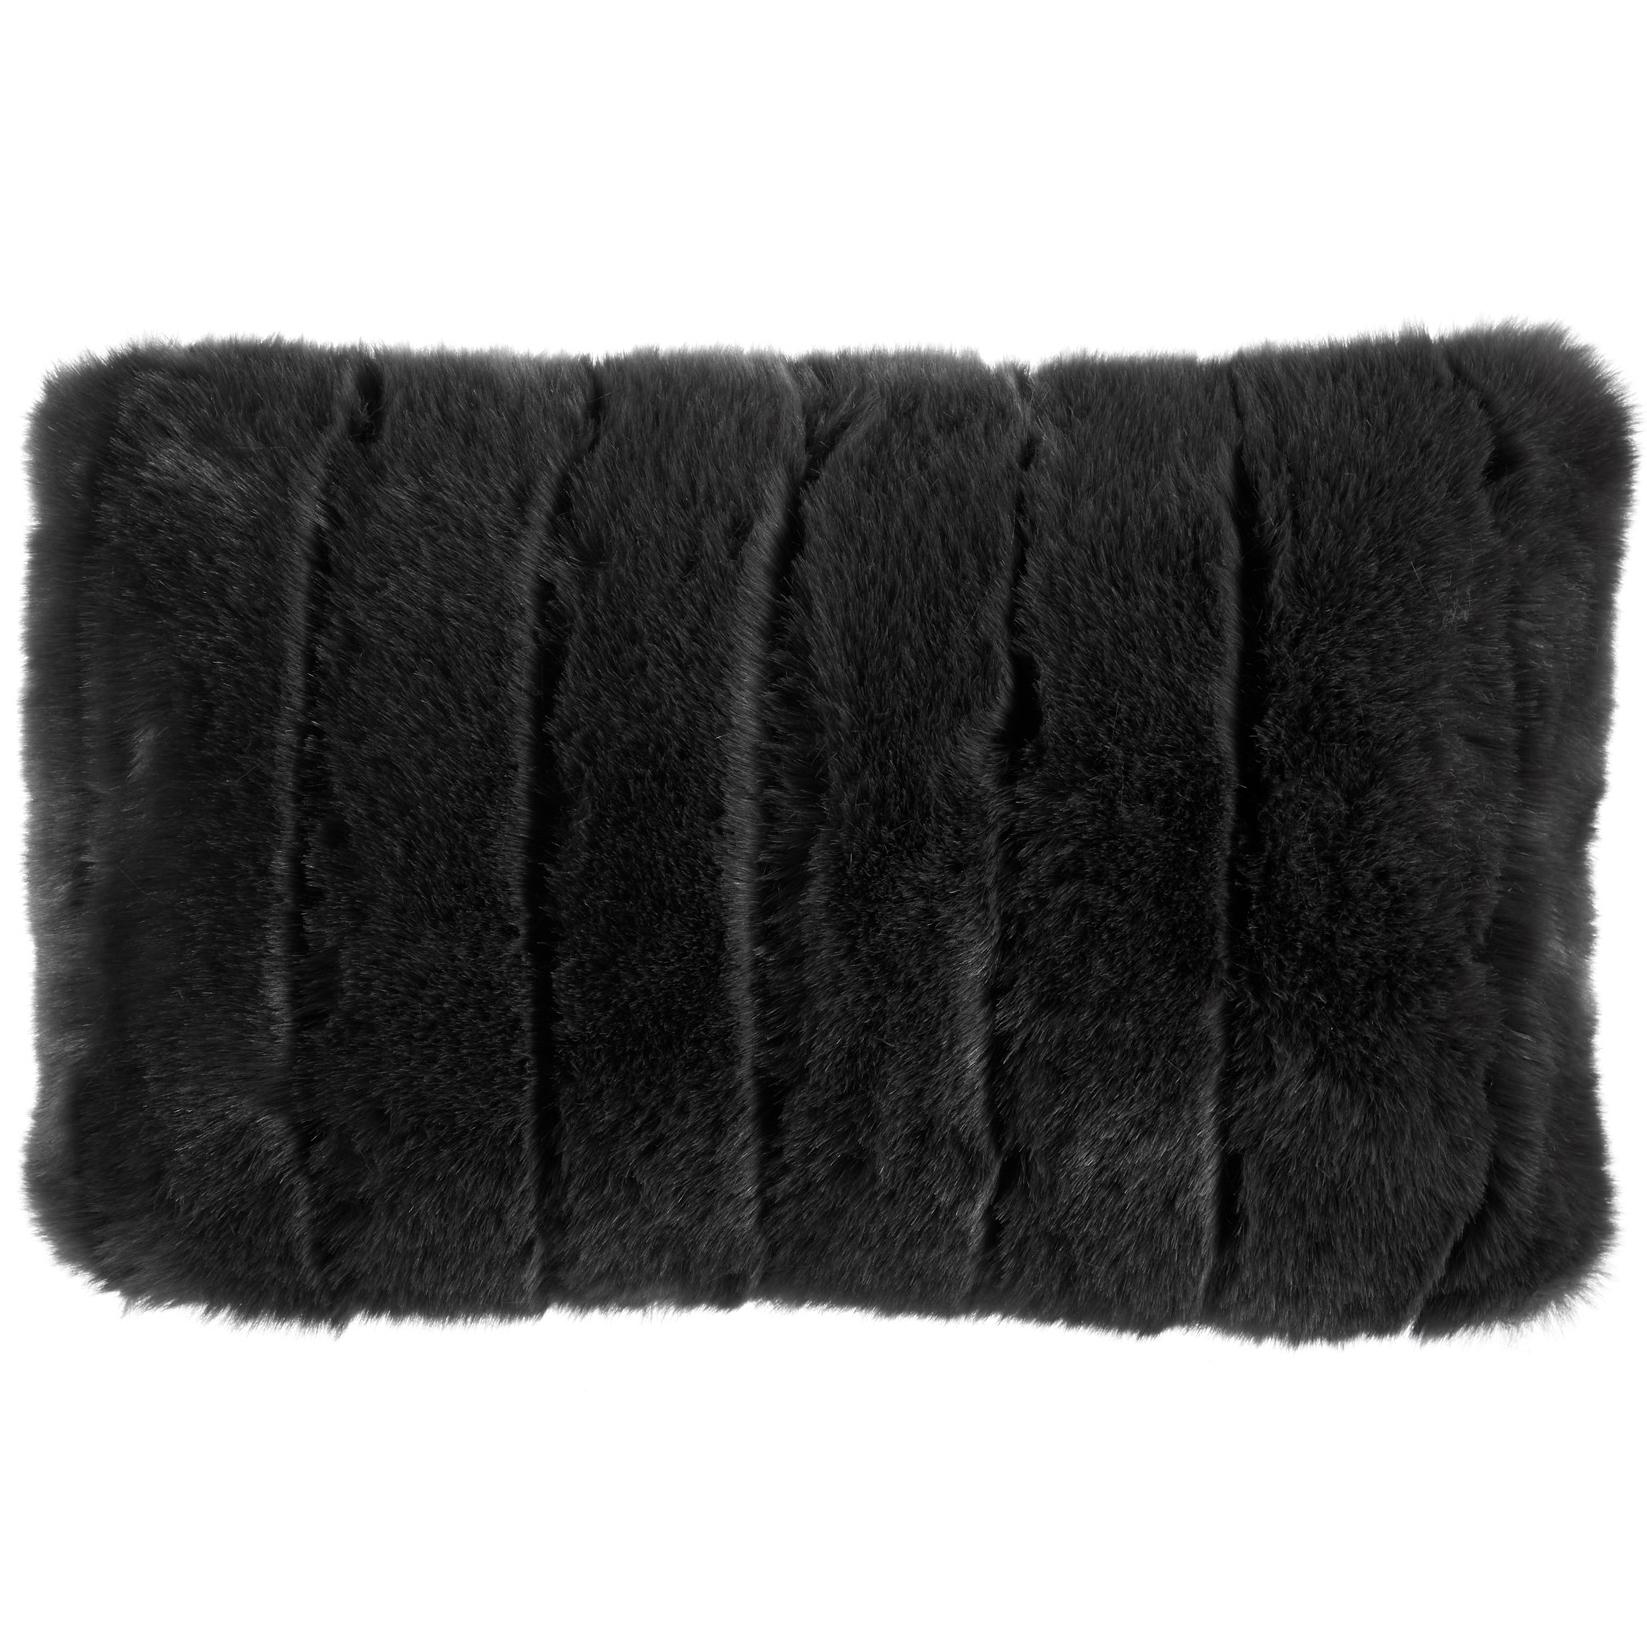 new elsworthy faux fur cushion bedding house cushions ebay. Black Bedroom Furniture Sets. Home Design Ideas